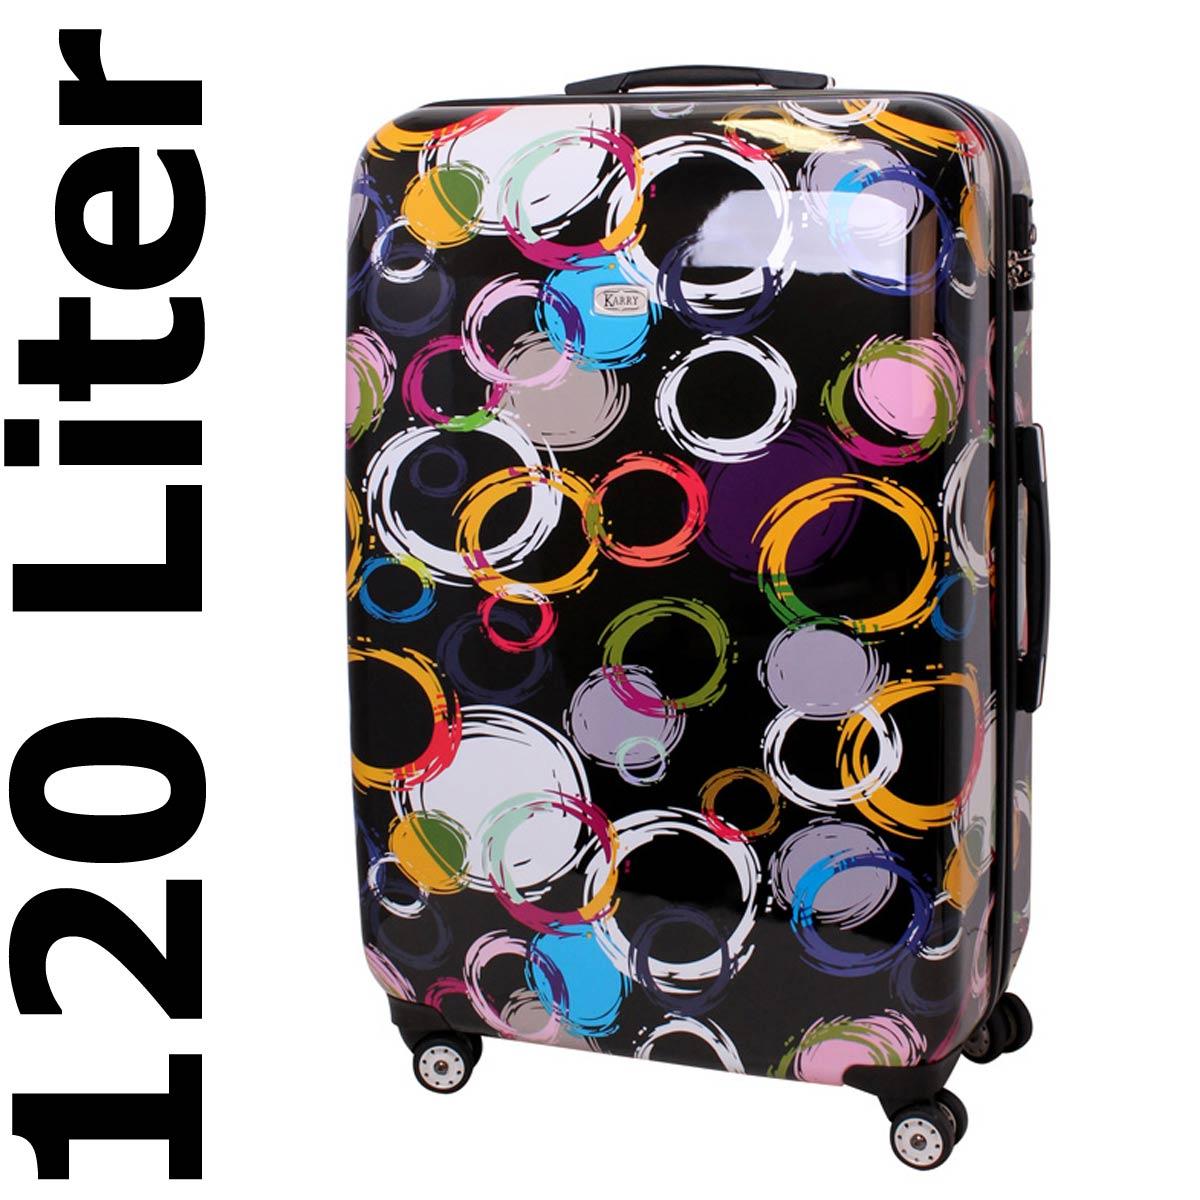 xxl coque rigide valise de voyage tsa polycarbonate 120 l. Black Bedroom Furniture Sets. Home Design Ideas